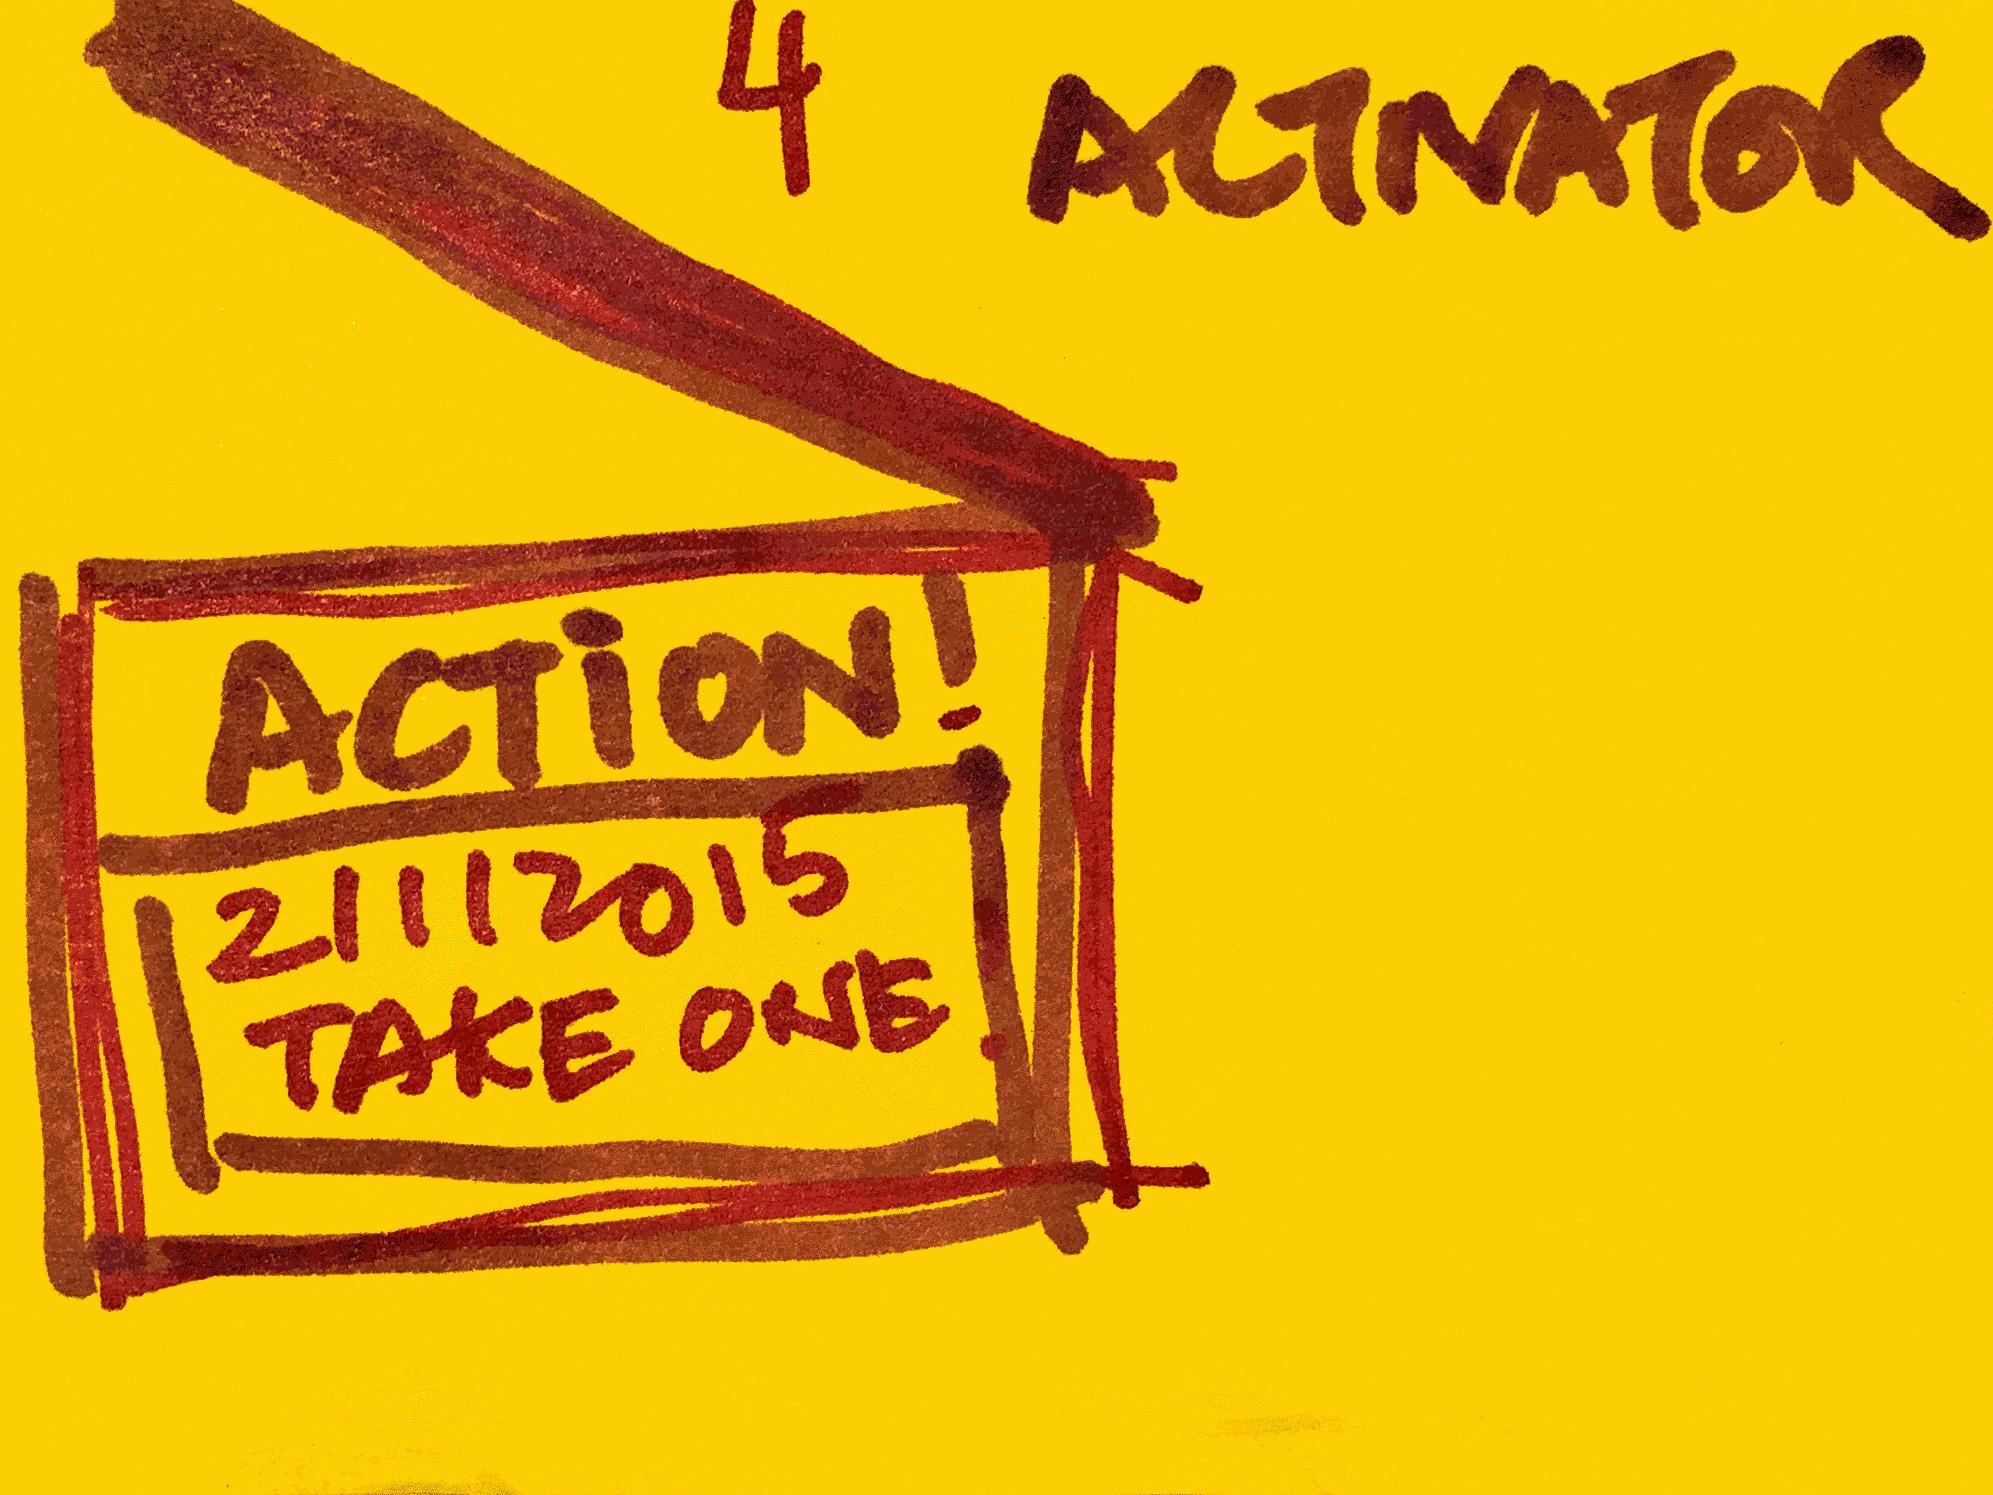 Activator Strengthsfinder Action Take One